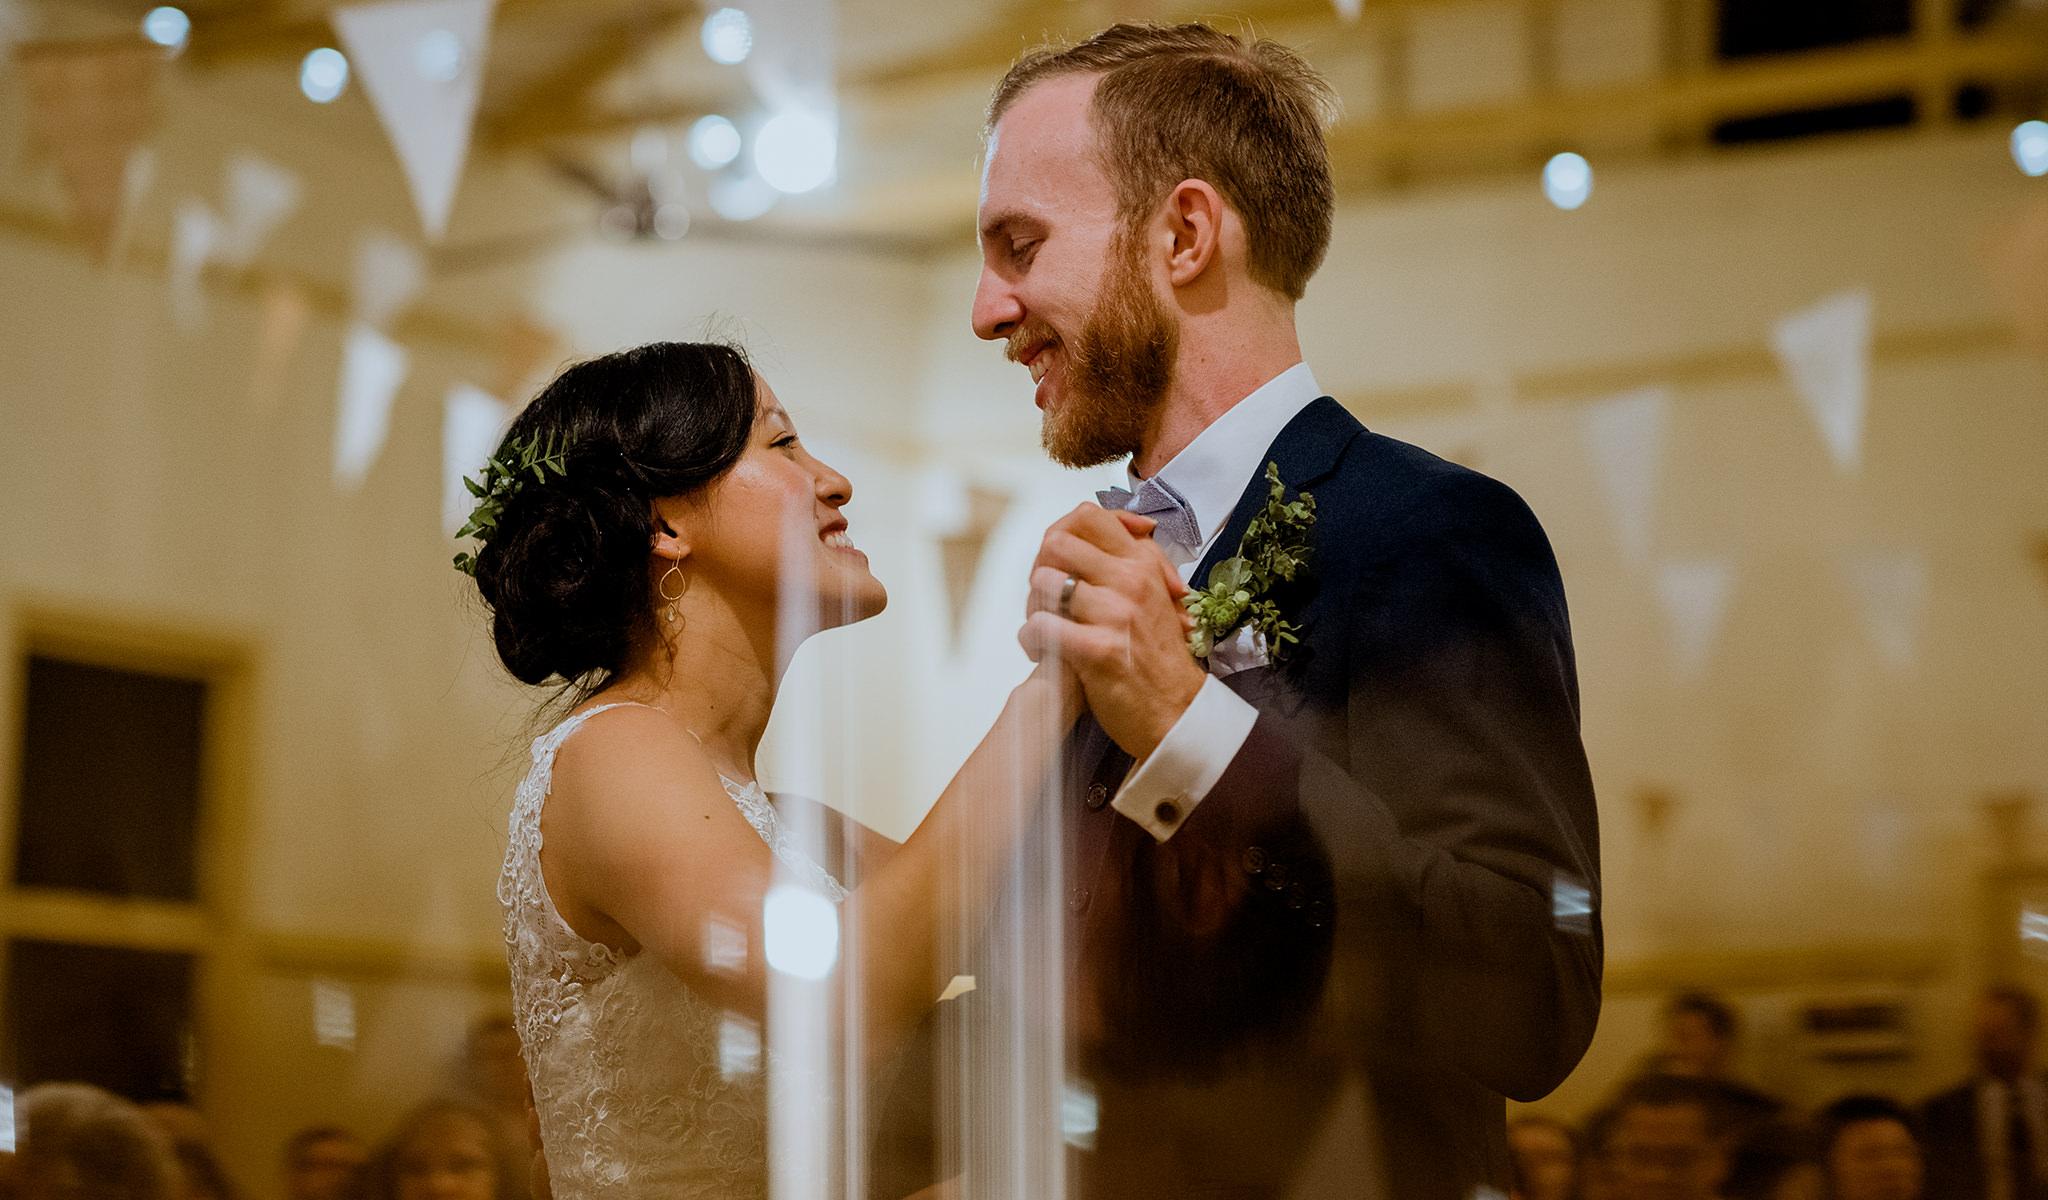 Interracial bride and groom enjoying first dance